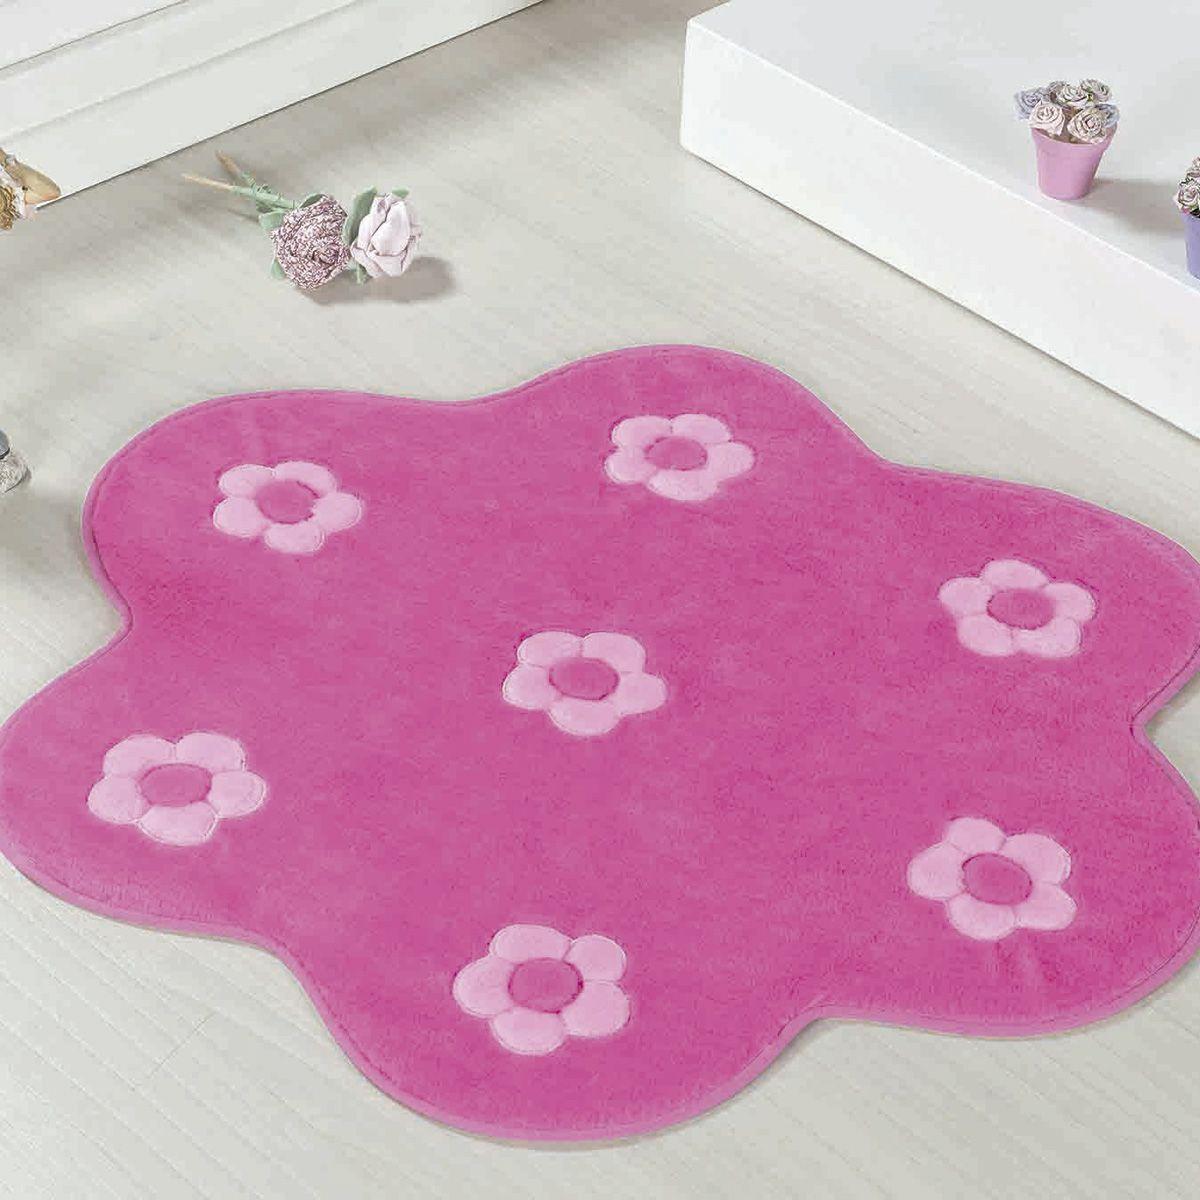 Tapete Big Infantil Premium Formato Jardim Pink 1,12m x 1,12m